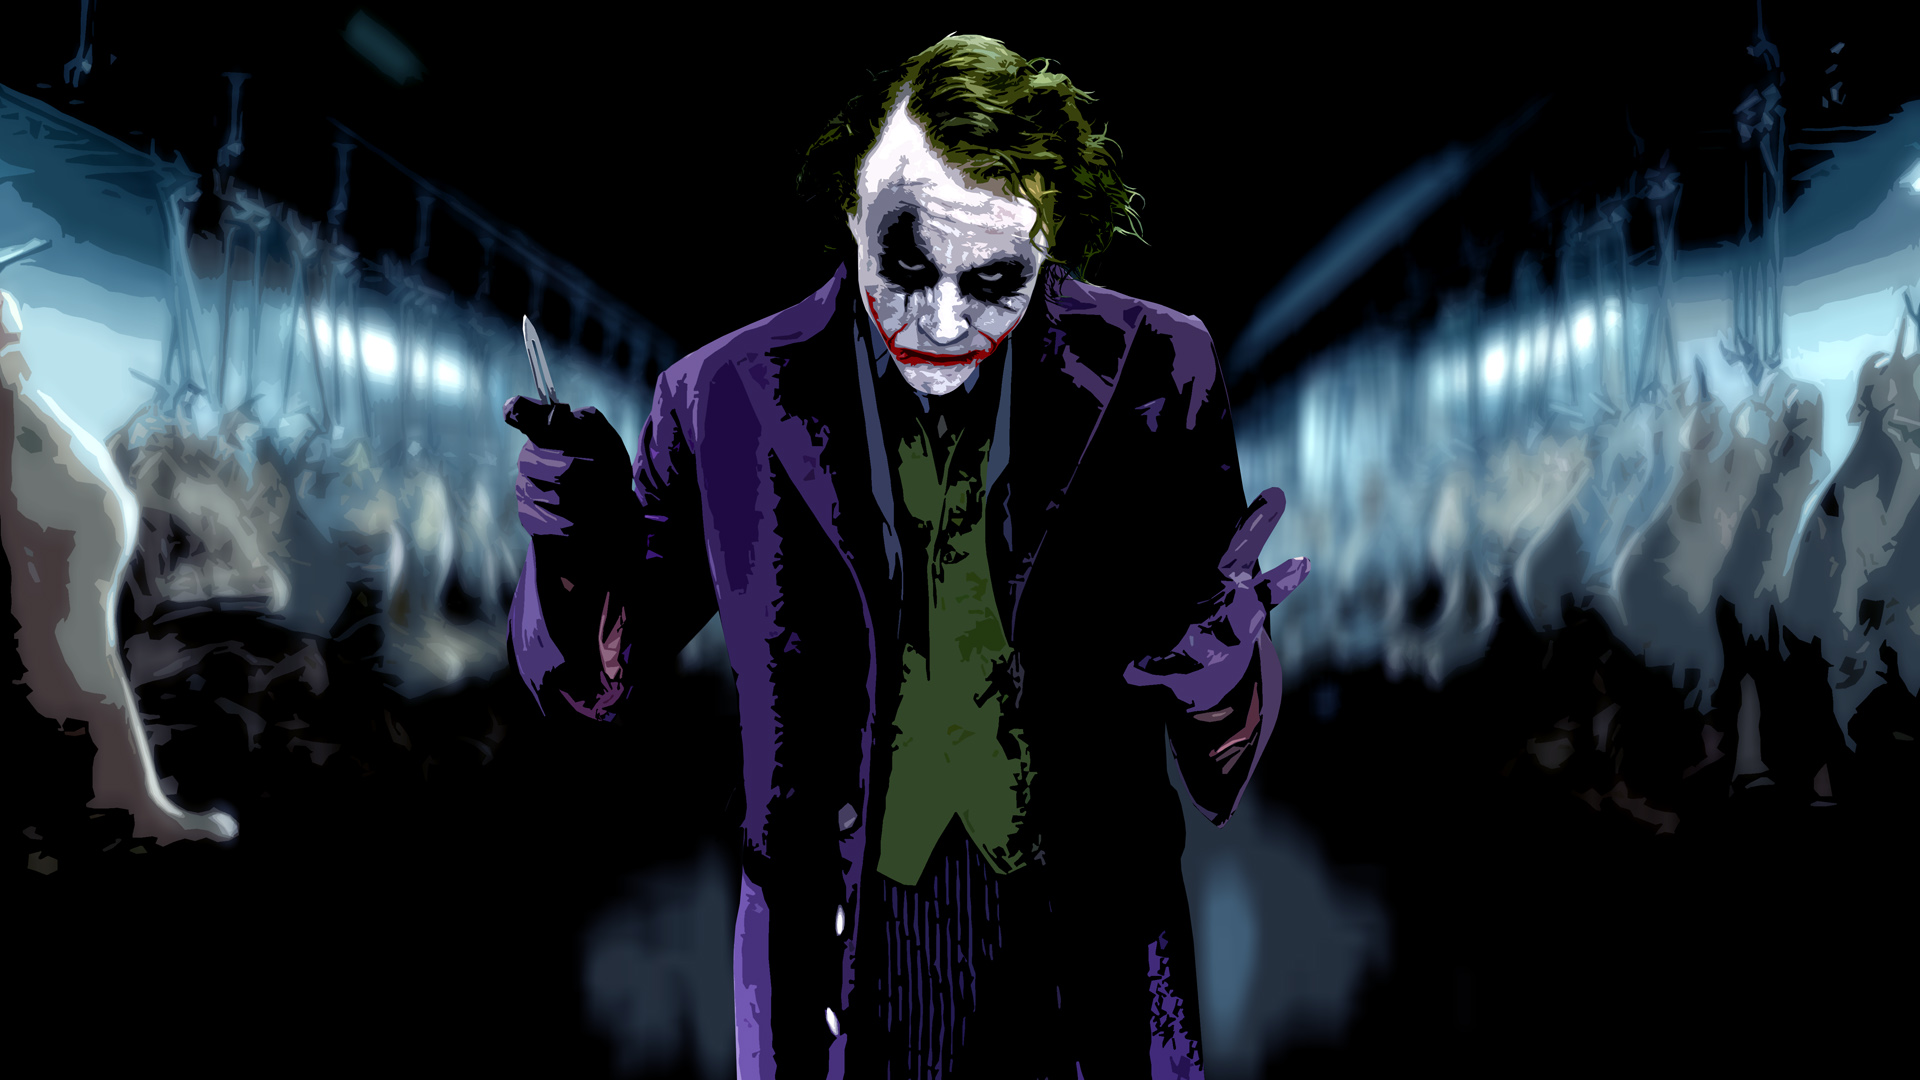 The Joker Heath Ledger Wallpaper 1920x1080